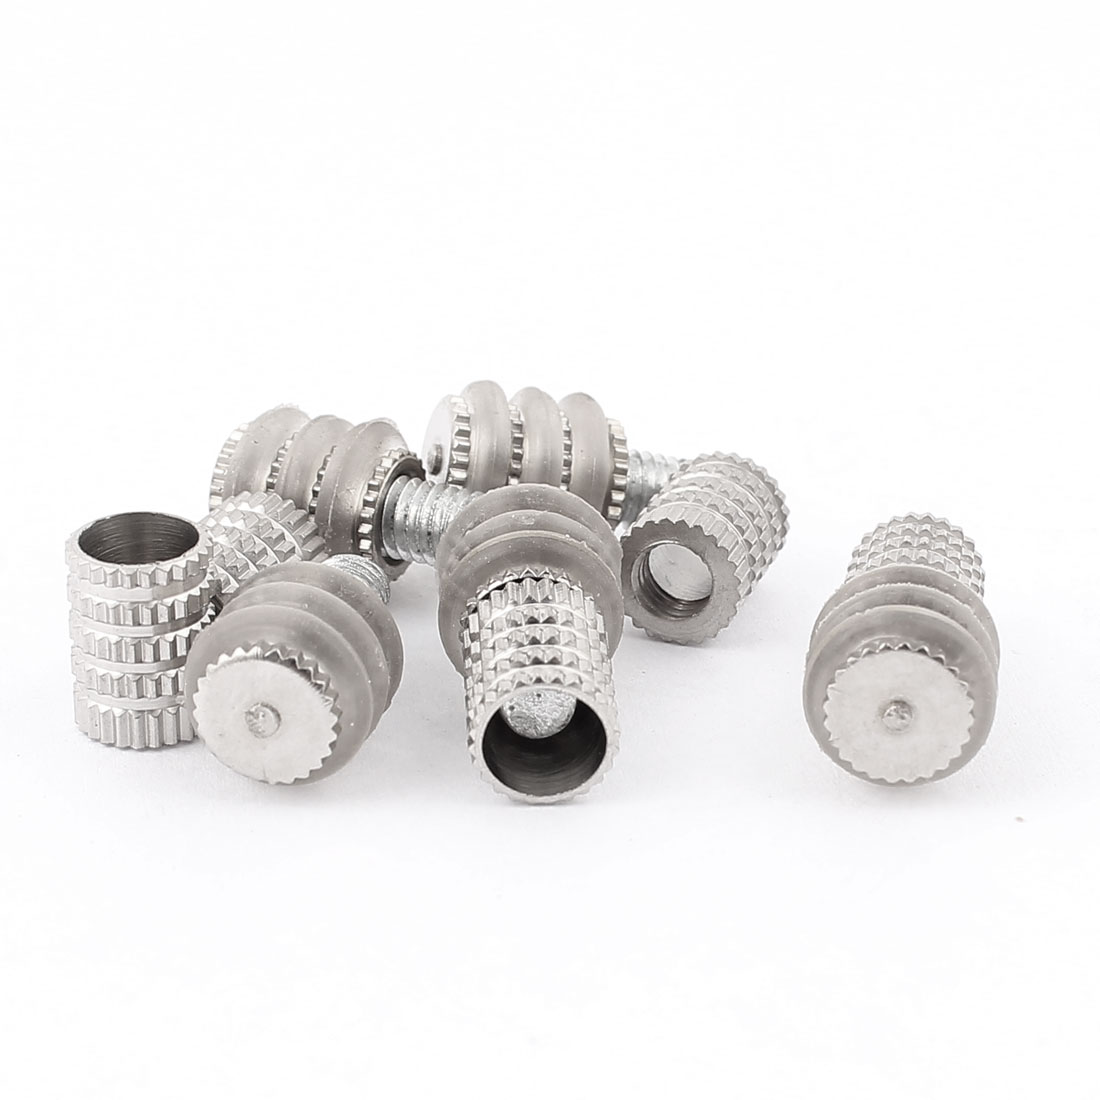 Metal Holder Shelf Support Pin Stud 8mm Screw Dia Silver Tone 5pcs